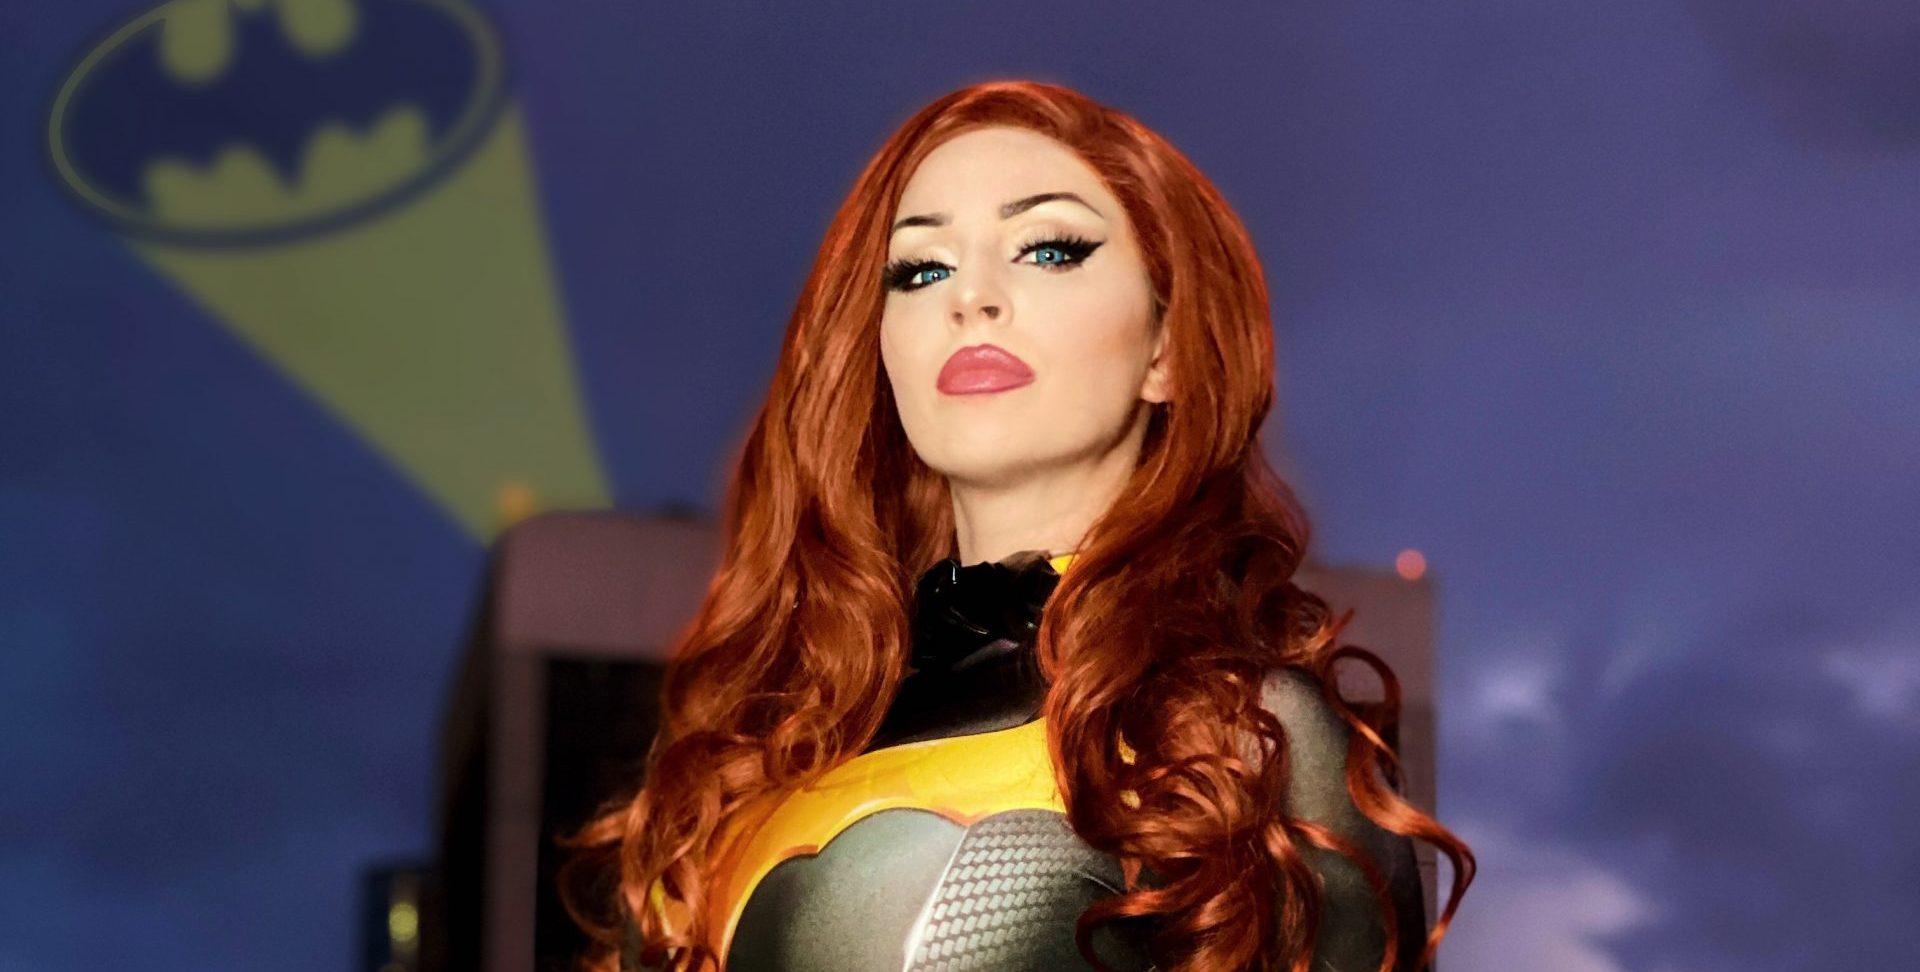 Cosplayer of the Month: SuperSailorVirgo